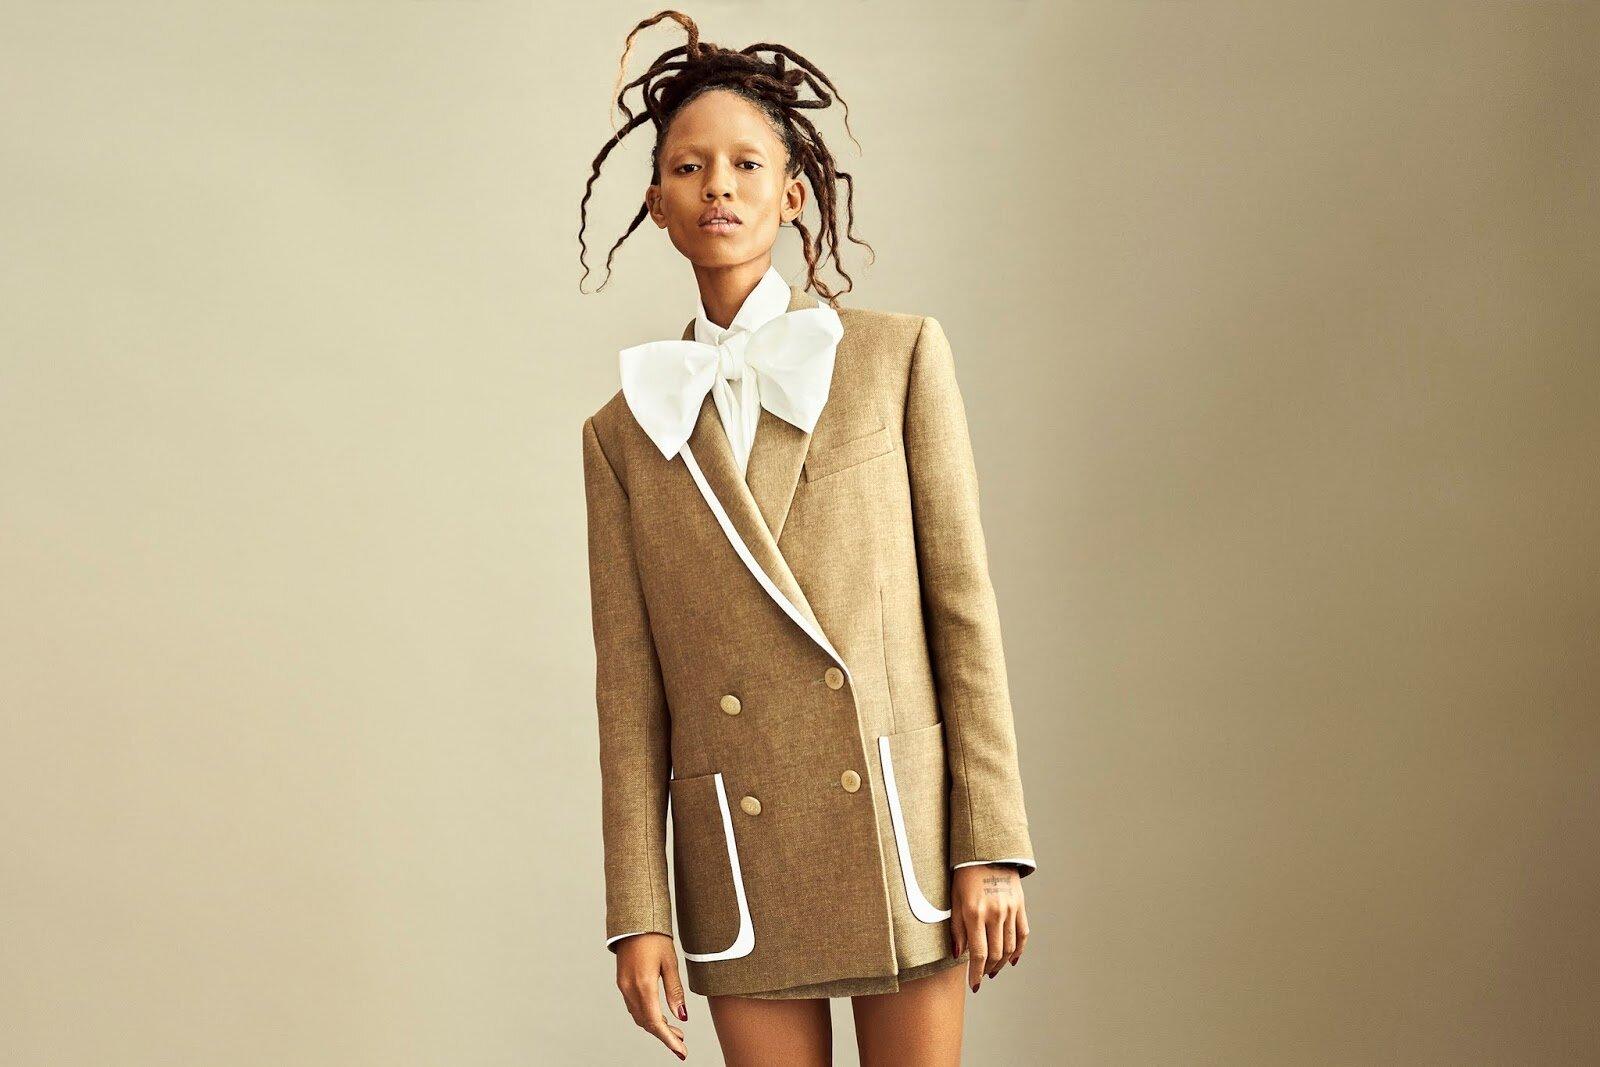 Blazer, skirt, and blouse, all Fendi. Adesuwa Aighewi by Philip Messmann.